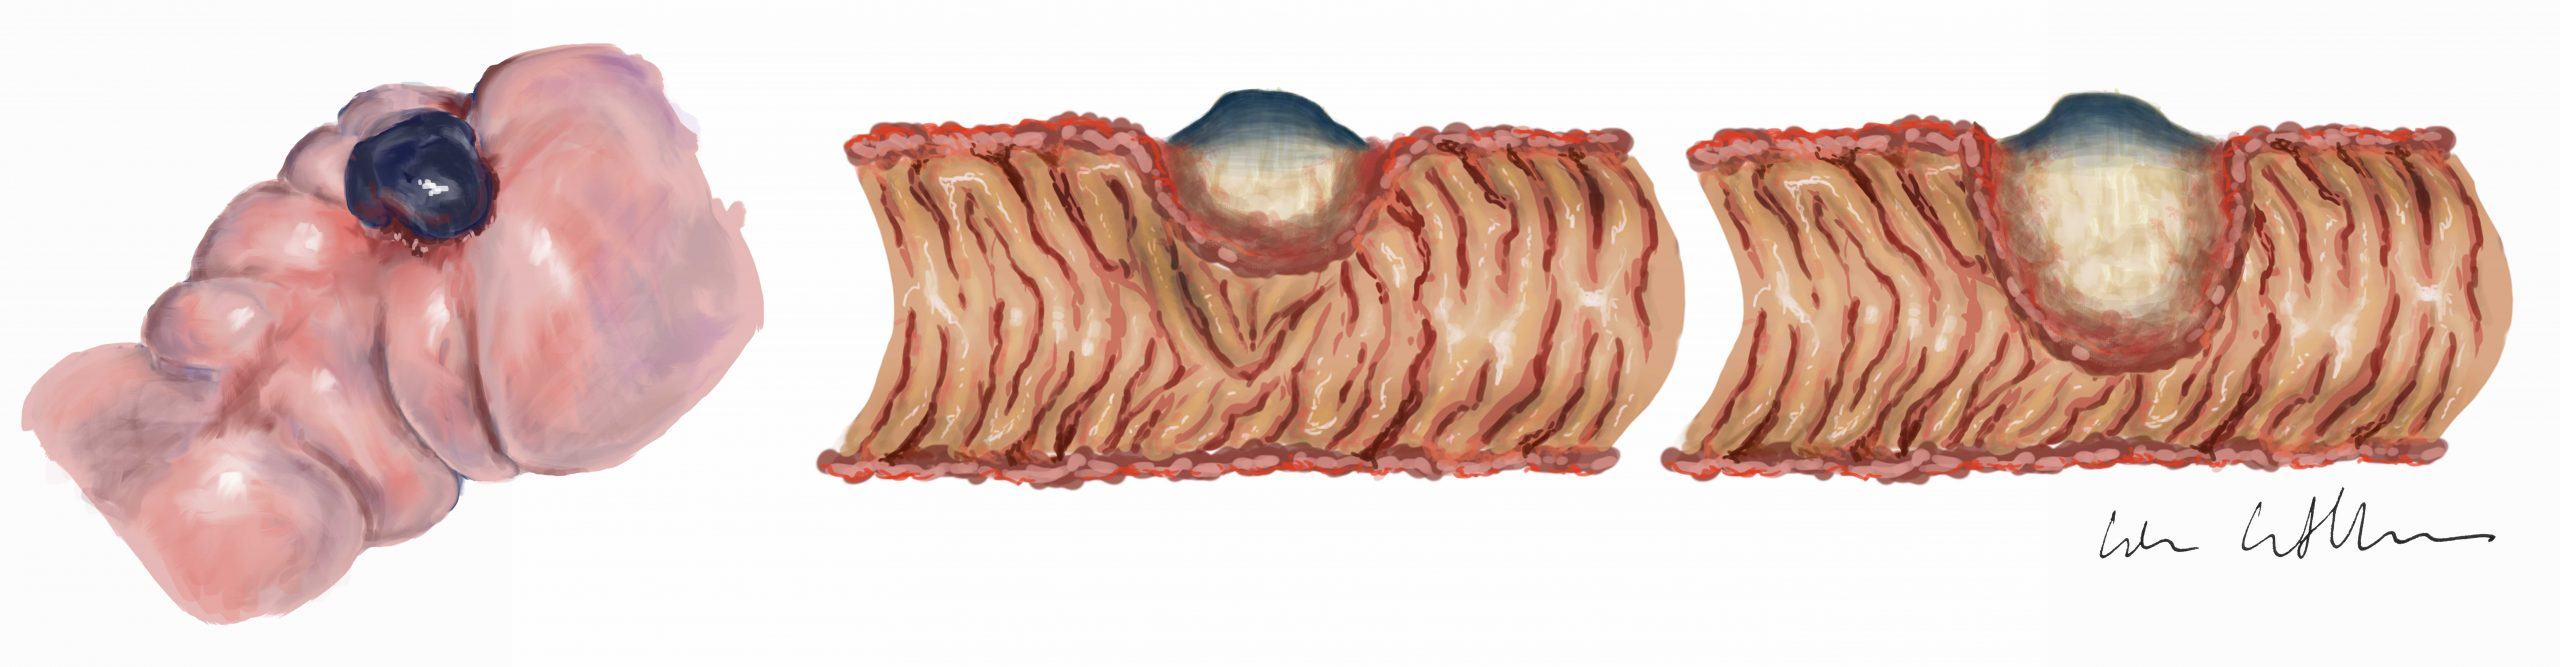 Deep infiltrating endometriosis, medical illustration, gynecology